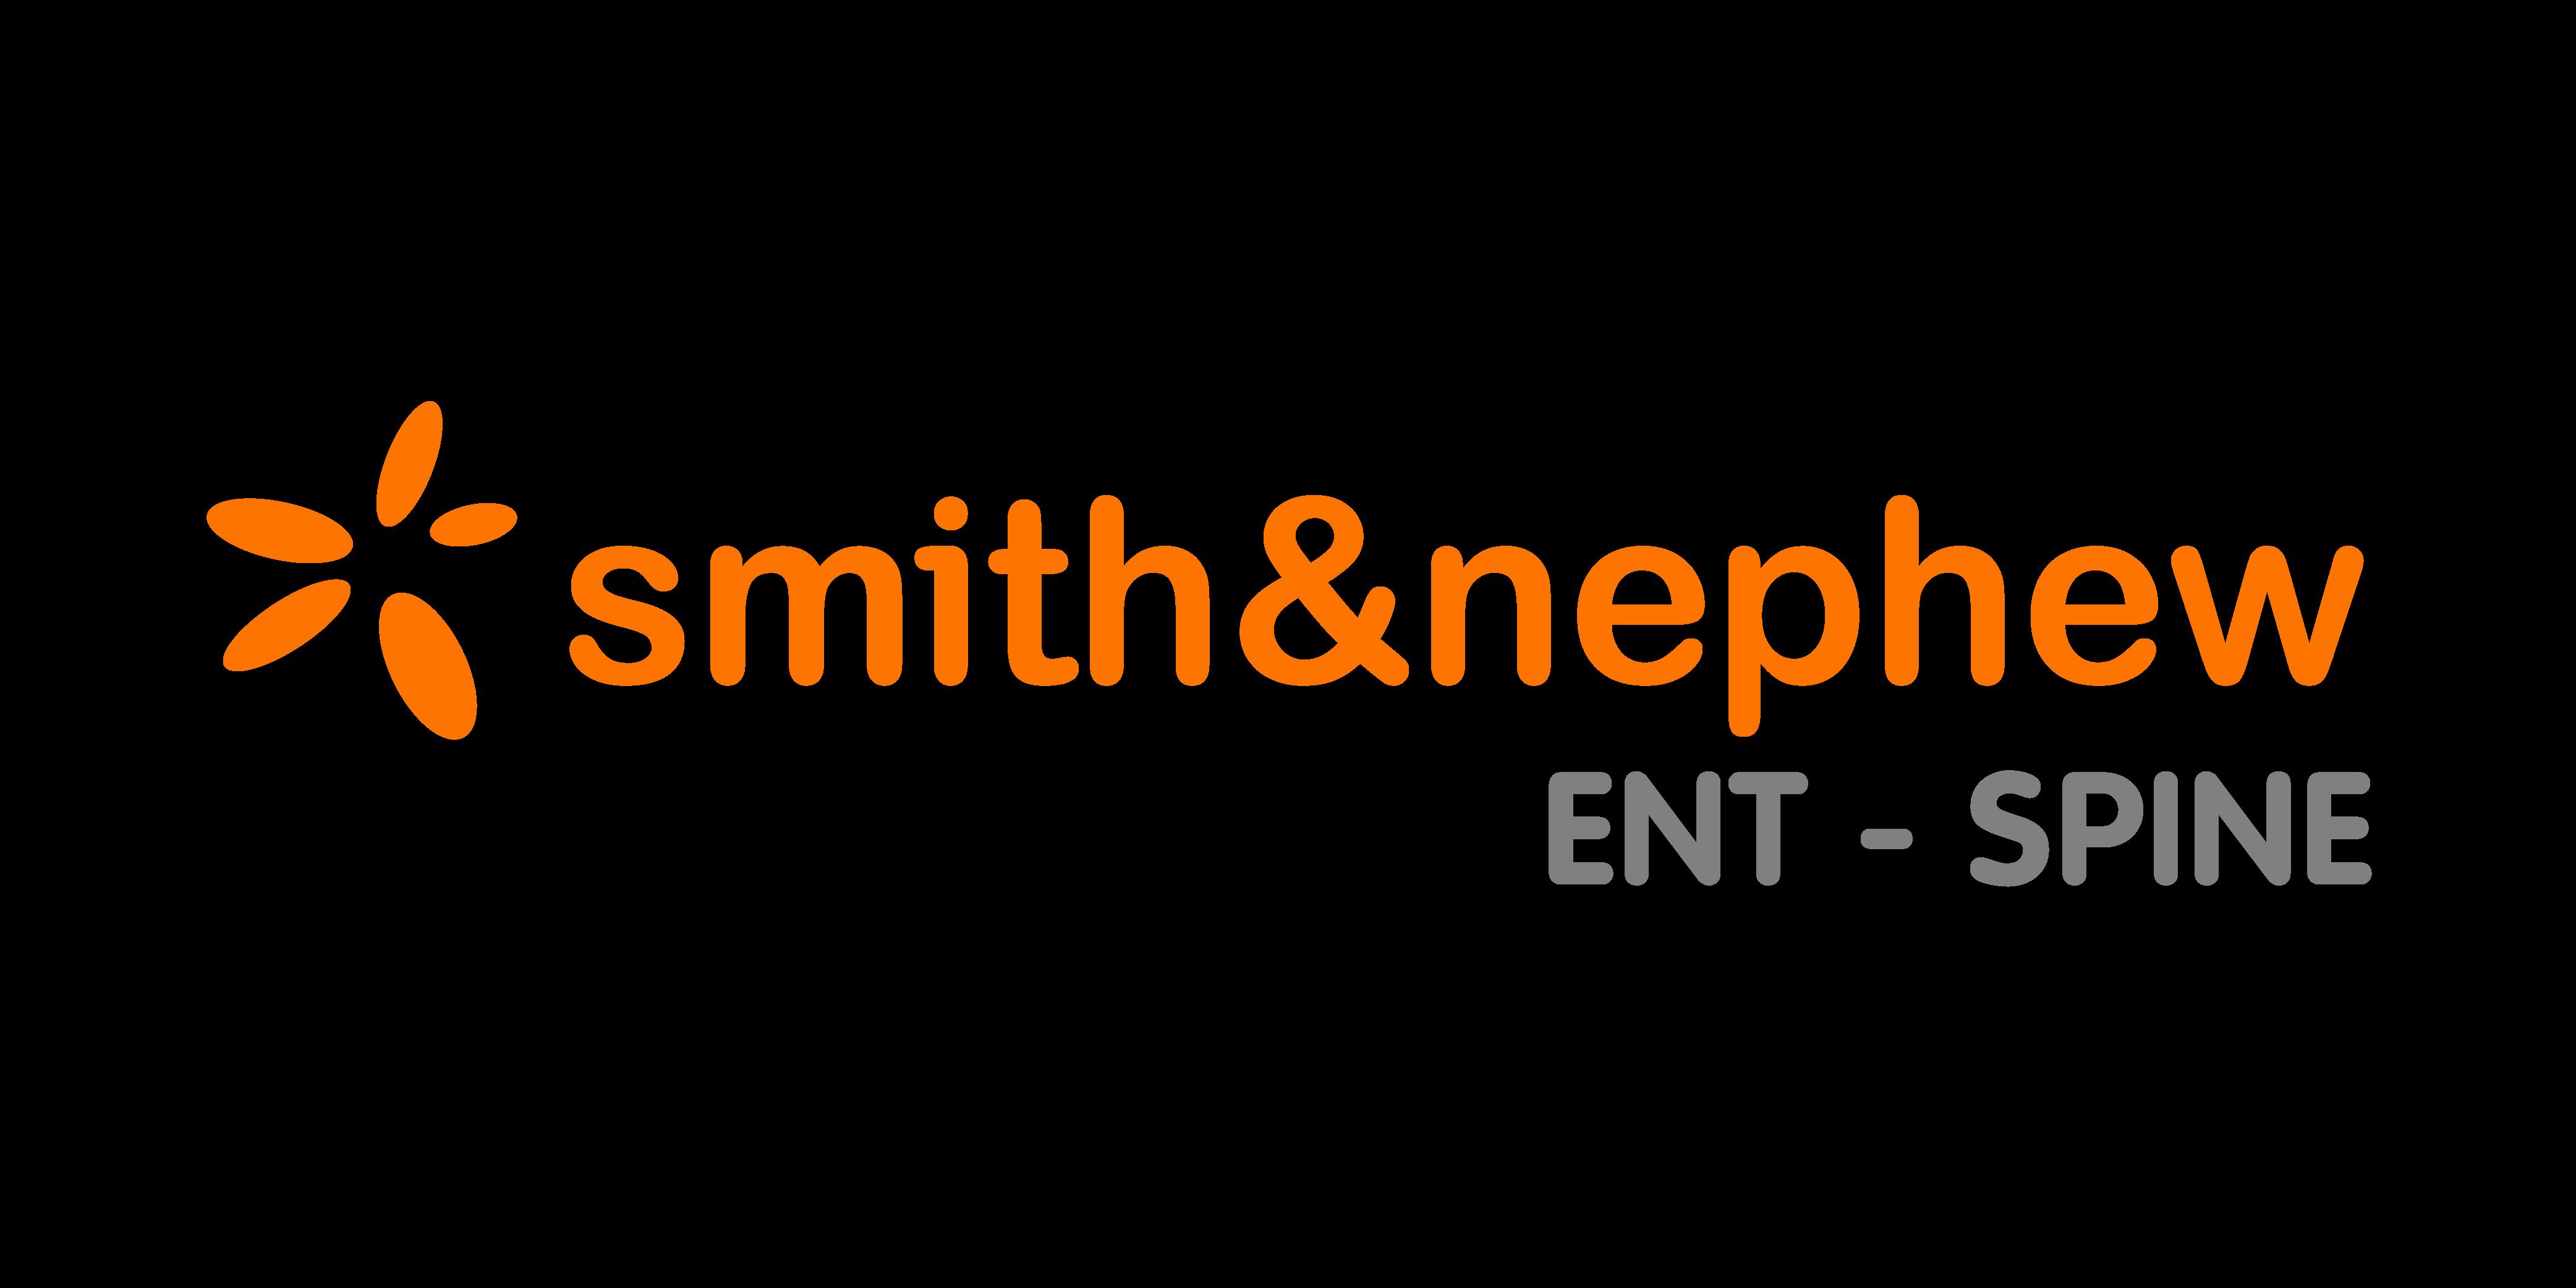 smithnephew-socio-comercial-artrolife-01